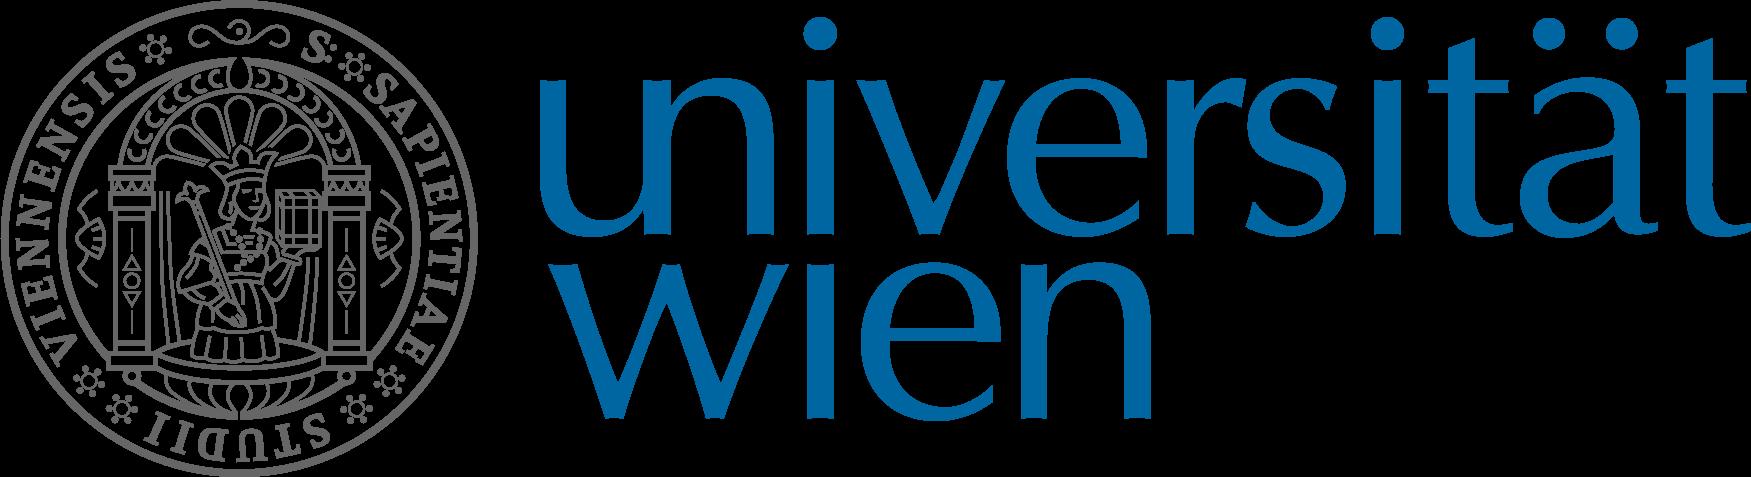 Logo of Vienna University, where Antonio Chemotti will be Visiting Fellow.